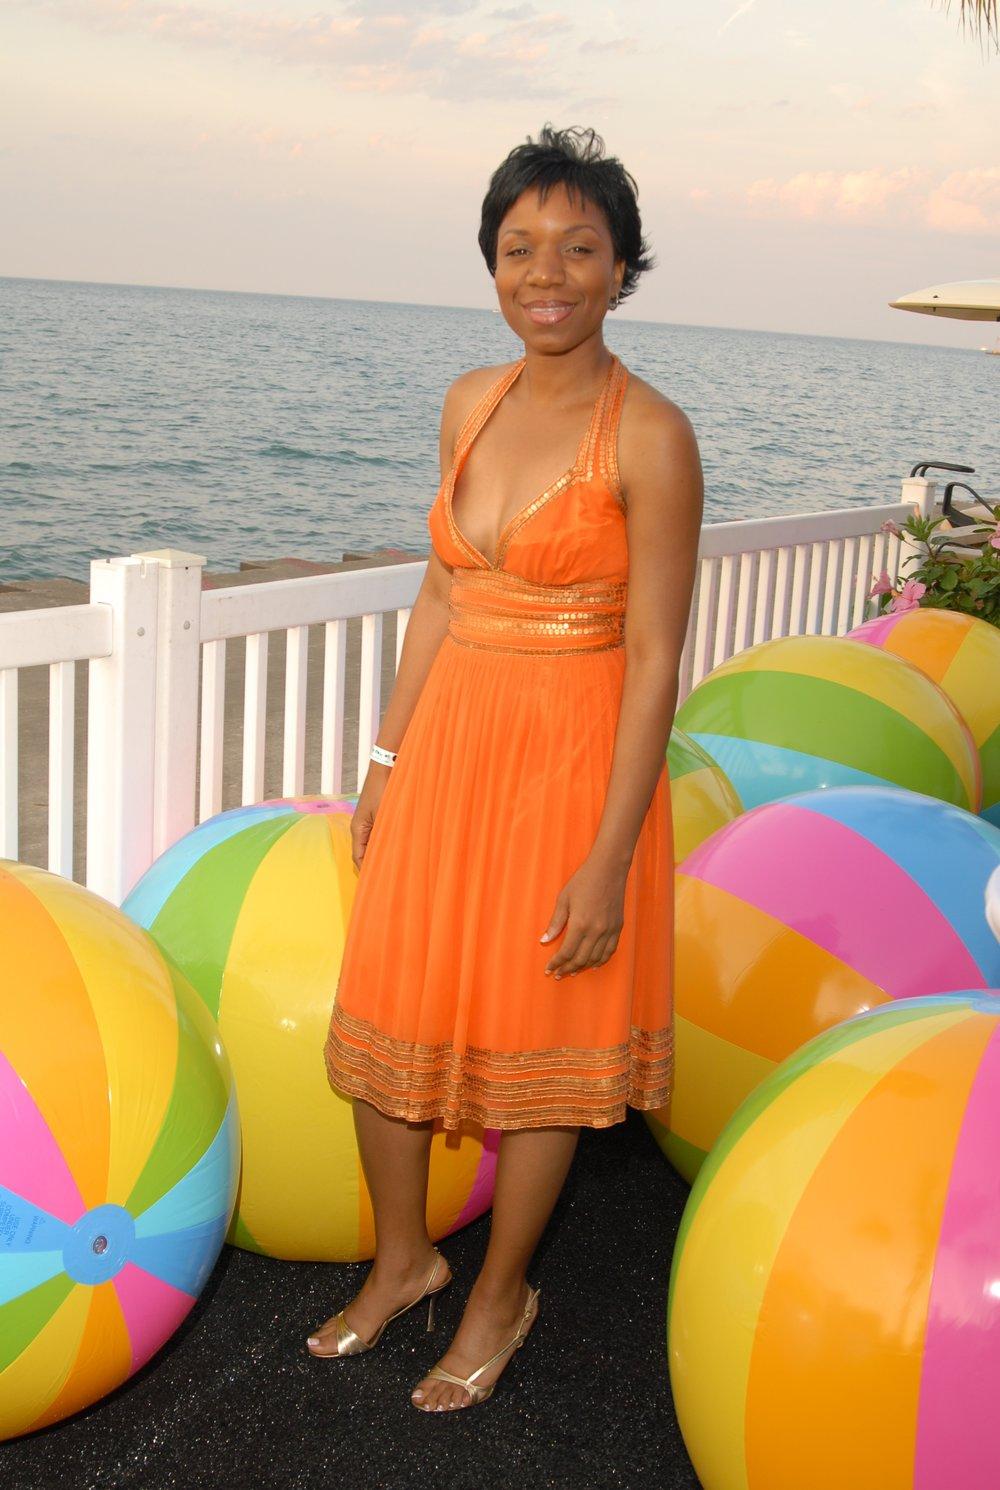 Chicago-beachfront-event-image-joanne-klee-marketing